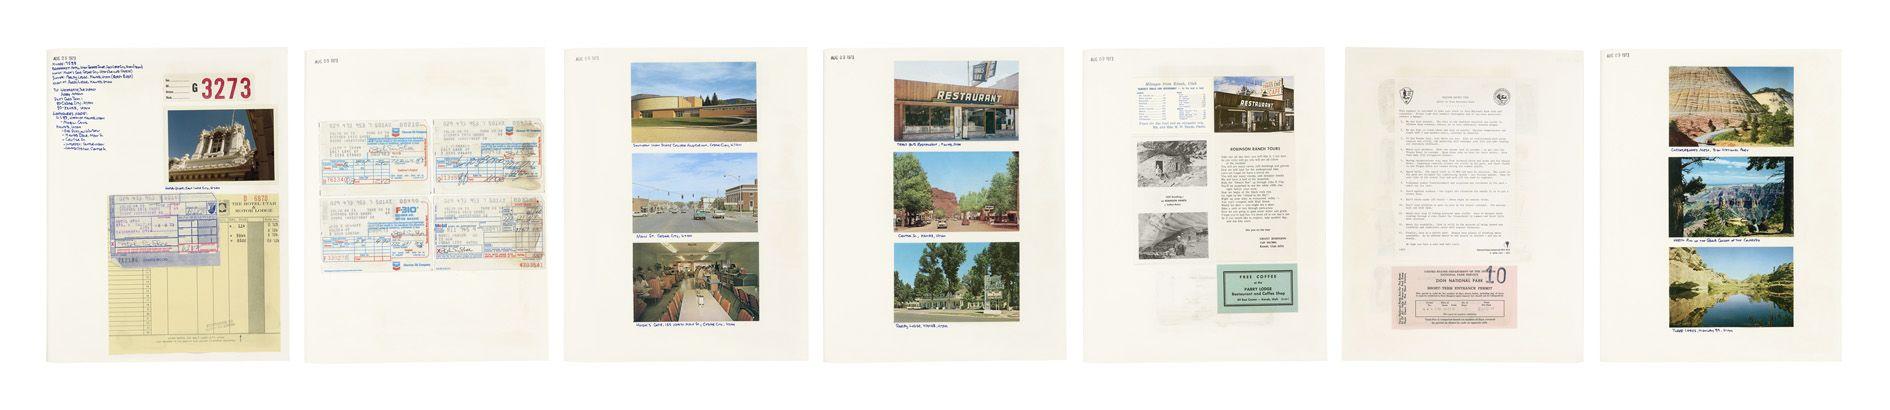 Stephen Shore – Uncommon Places – Berlin